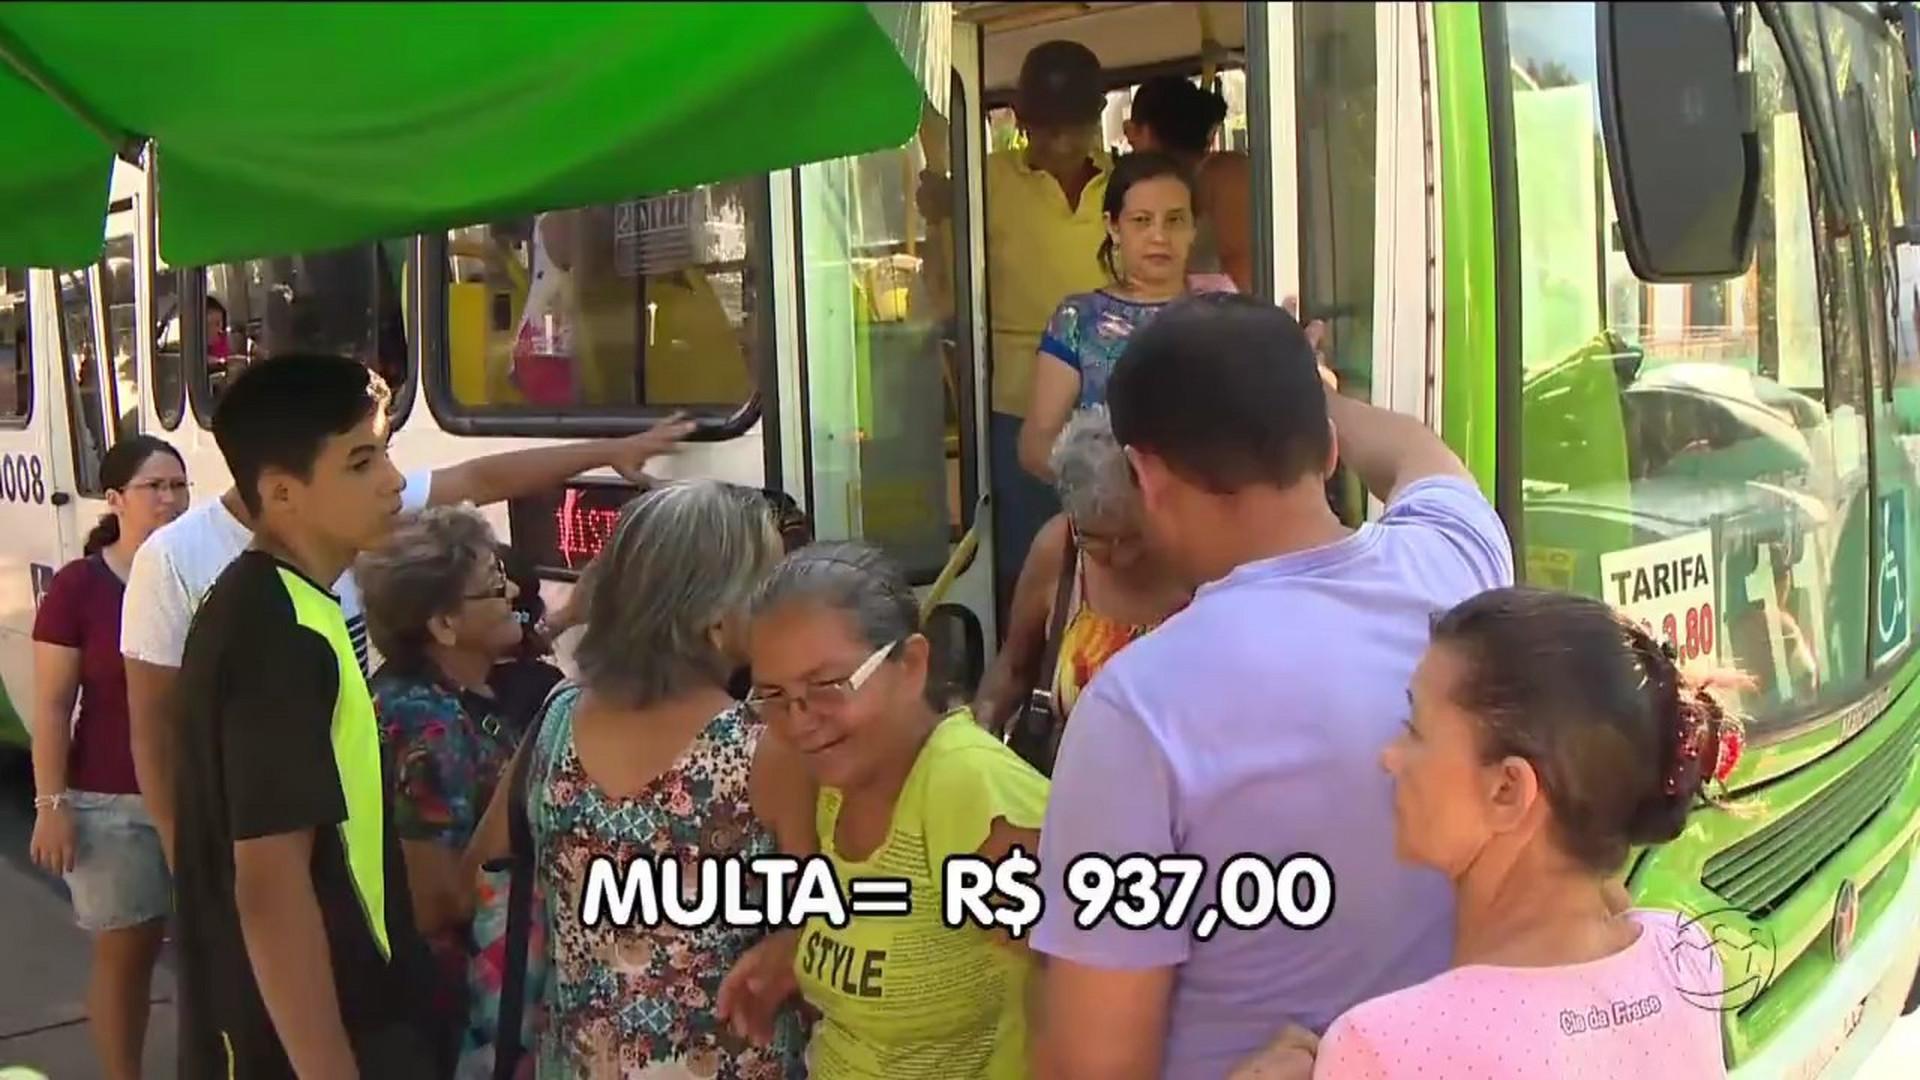 LEI PODE MULTAR PASSAGEIROS POR DESRESPEITO AOS MOTORISTAS DE ÔNIBUS - A Crítica Na Tv - 14/08/17